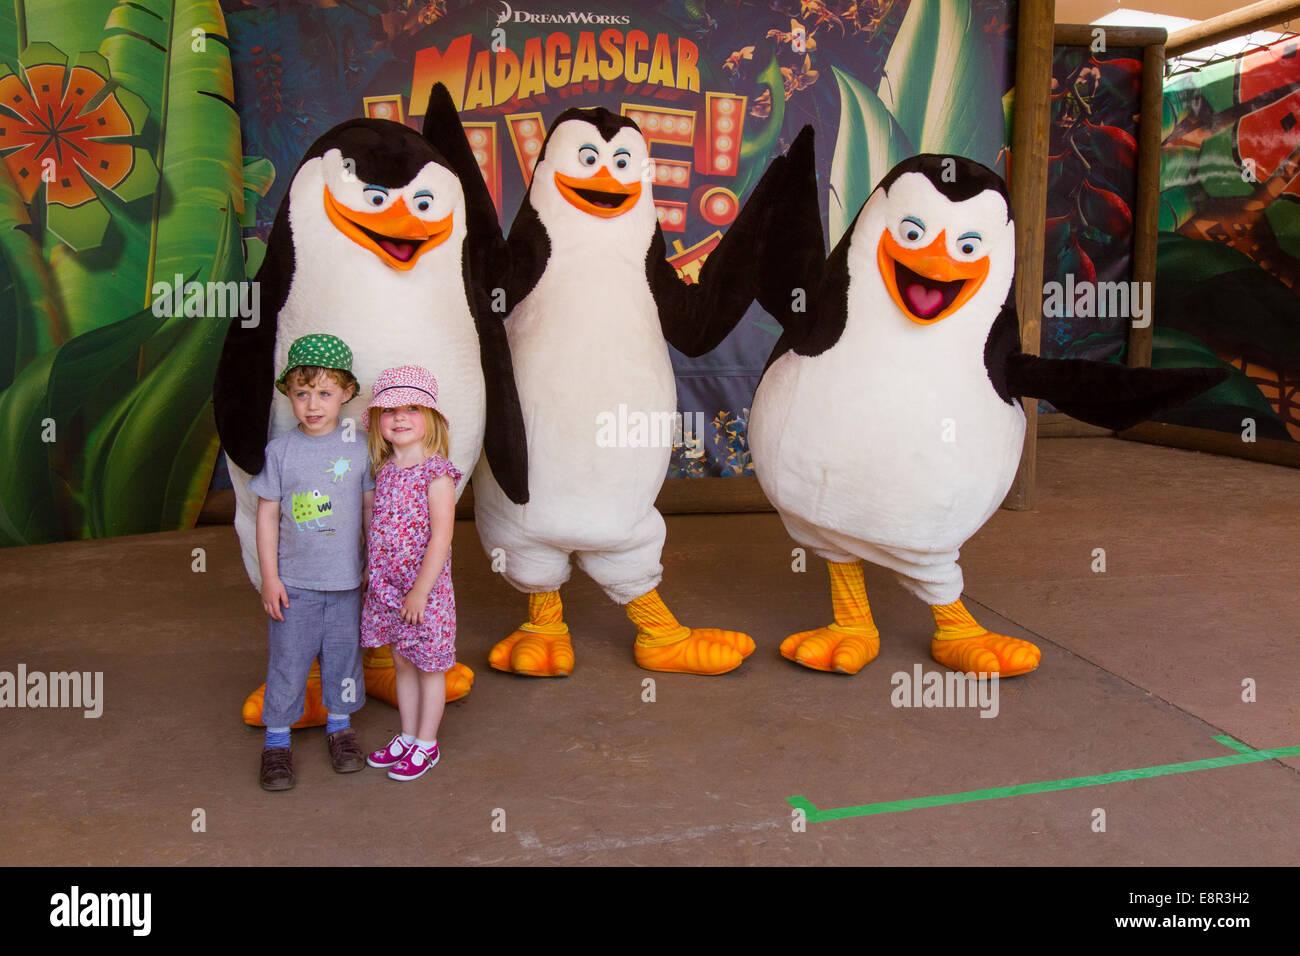 Madagascar live show at Chessington World of Adventures, Surrey, United Kingdom. - Stock Image